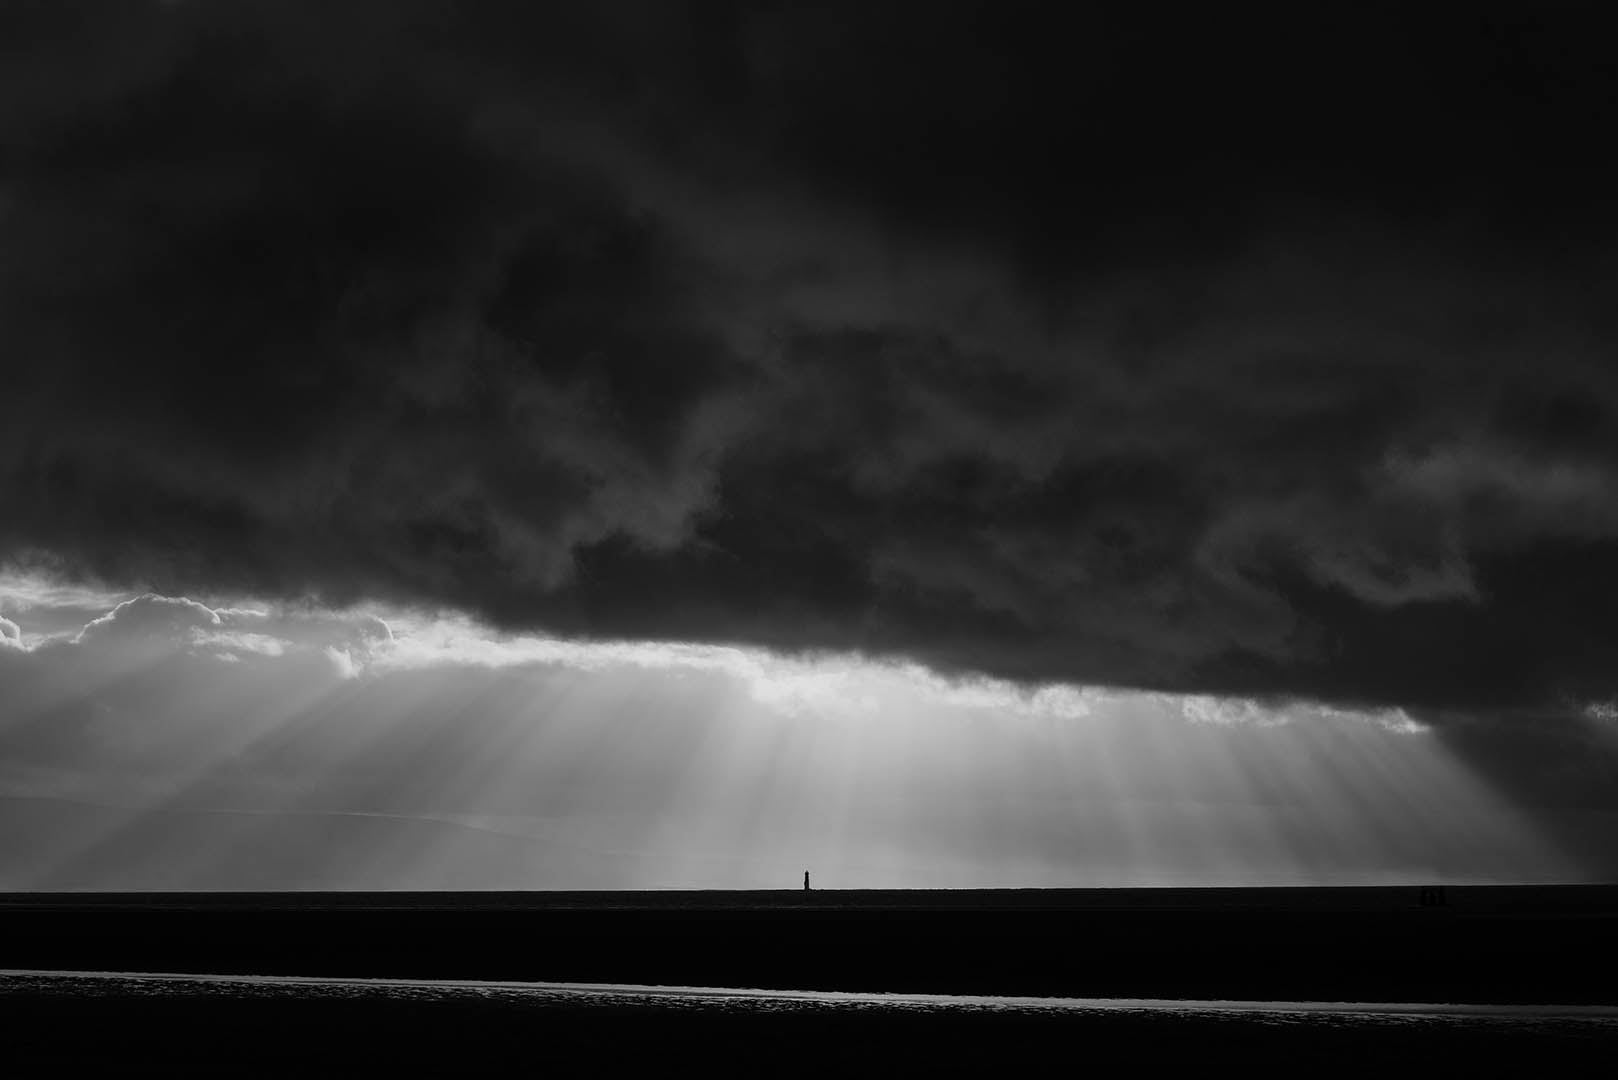 Break in the Clouds at Rosses Point, Sligo